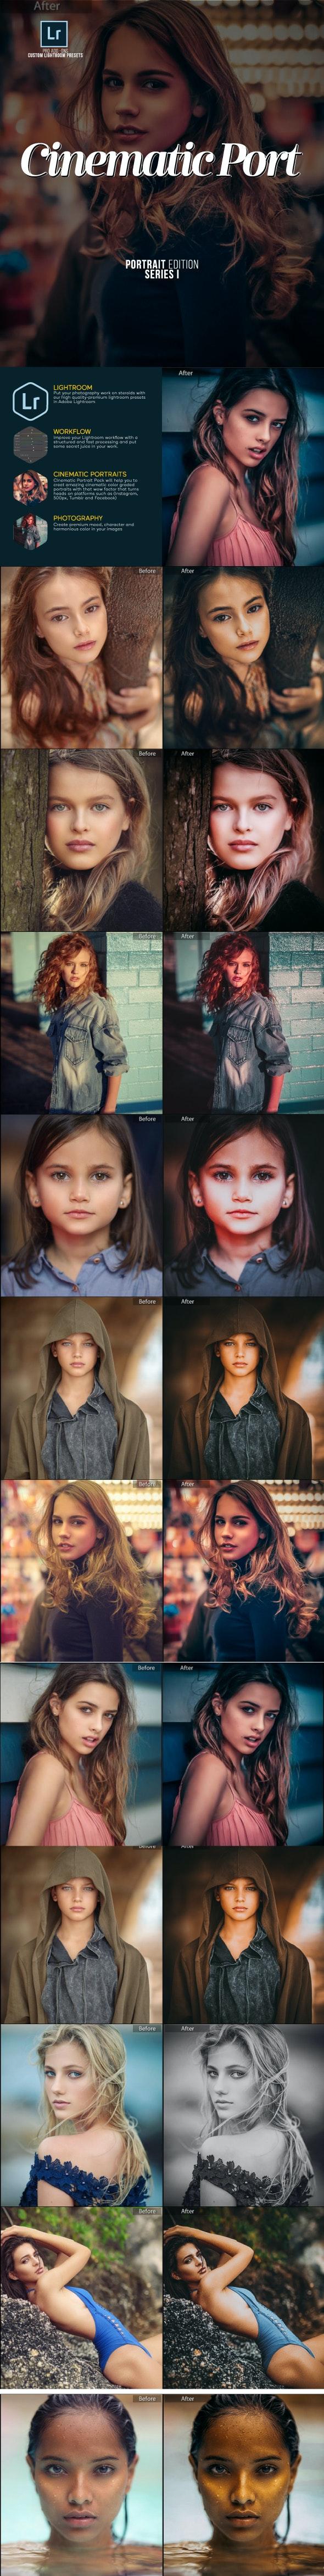 Cinematic Moody Portrait Lightroom Presets - Portrait Lightroom Presets